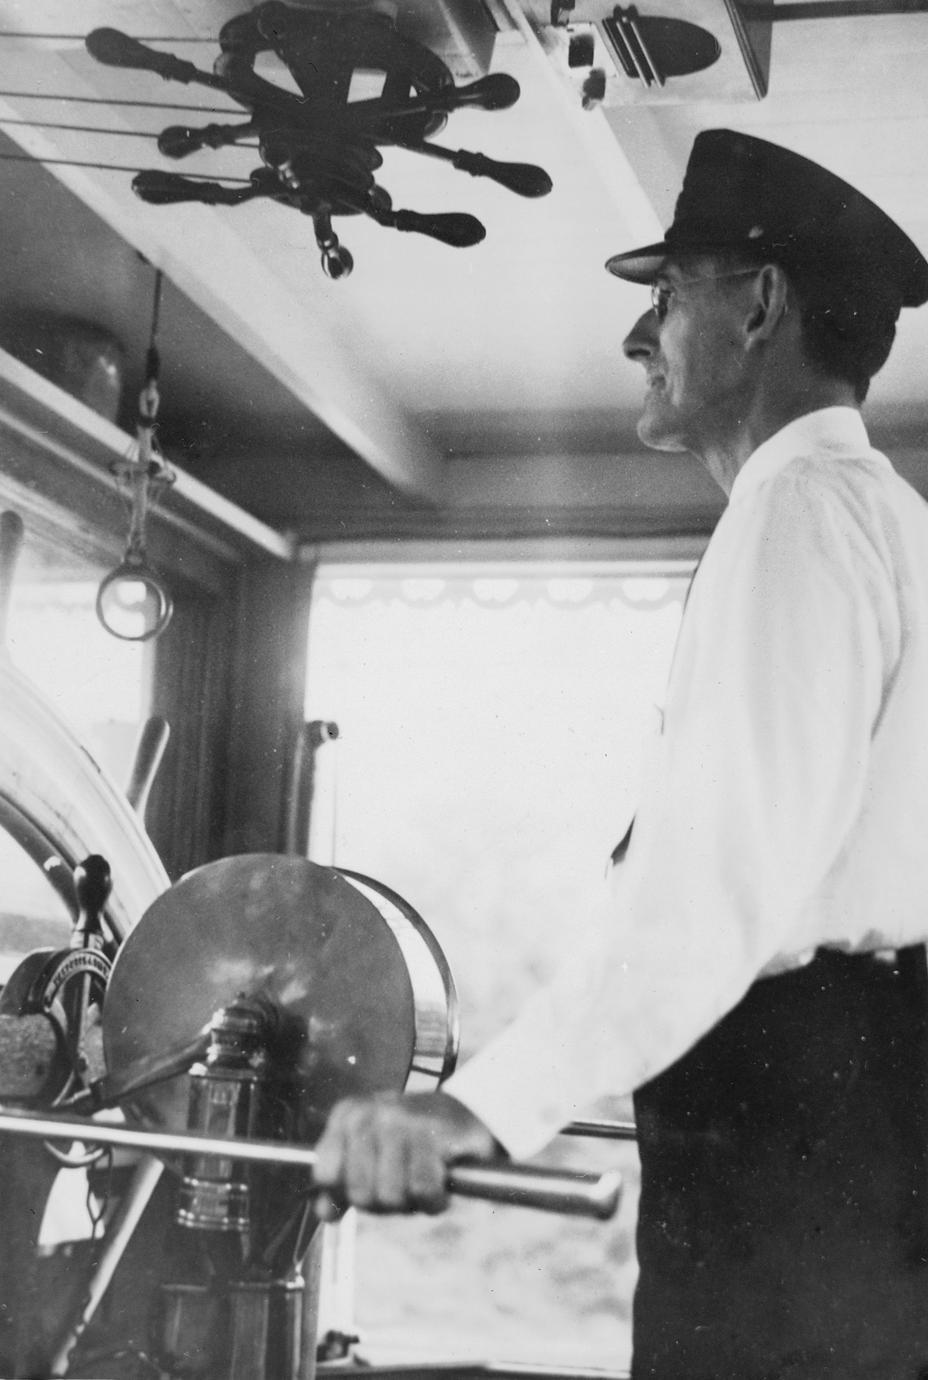 Gordon C. Greene (Packet/Excursion, 1935-1952)